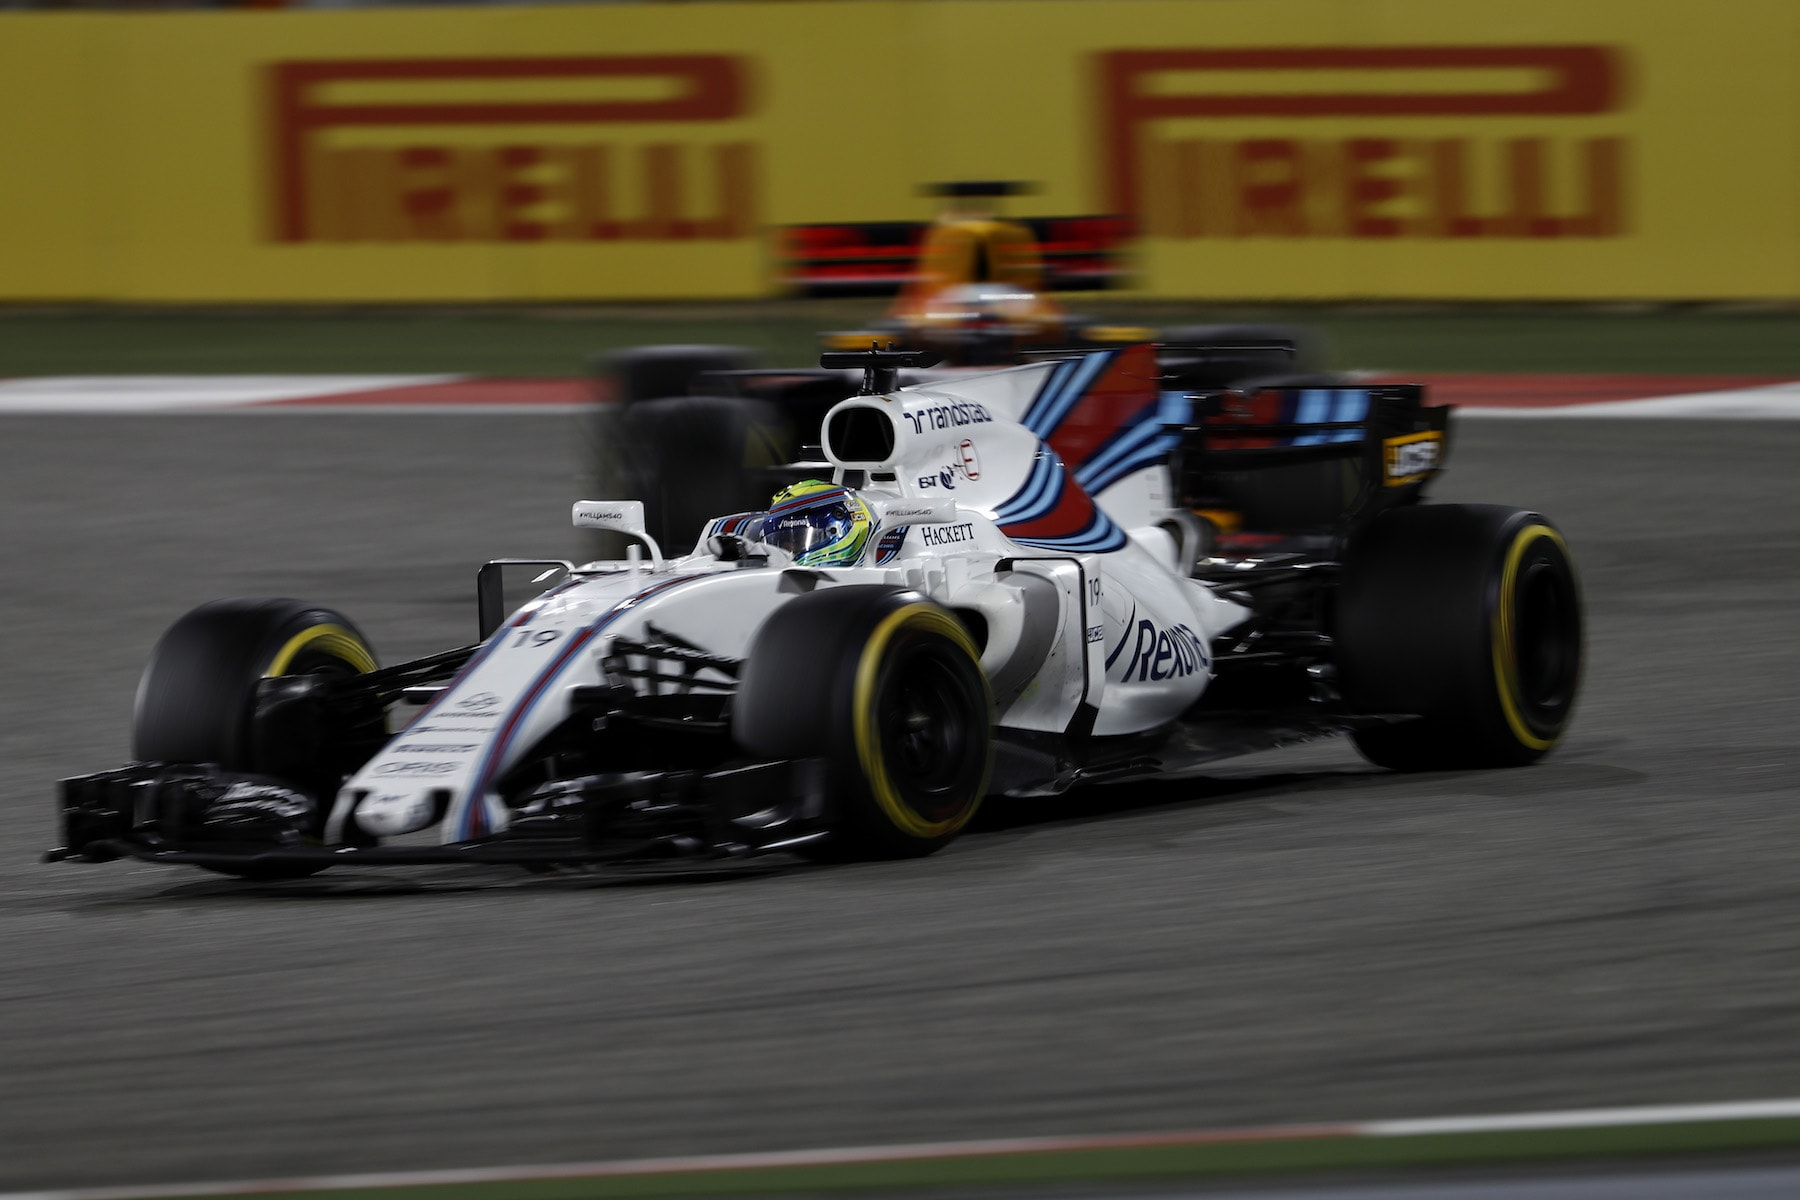 H 2017 Felipe Massa   Williams FW40   2017 Bahrain GP 1 copy.JPG